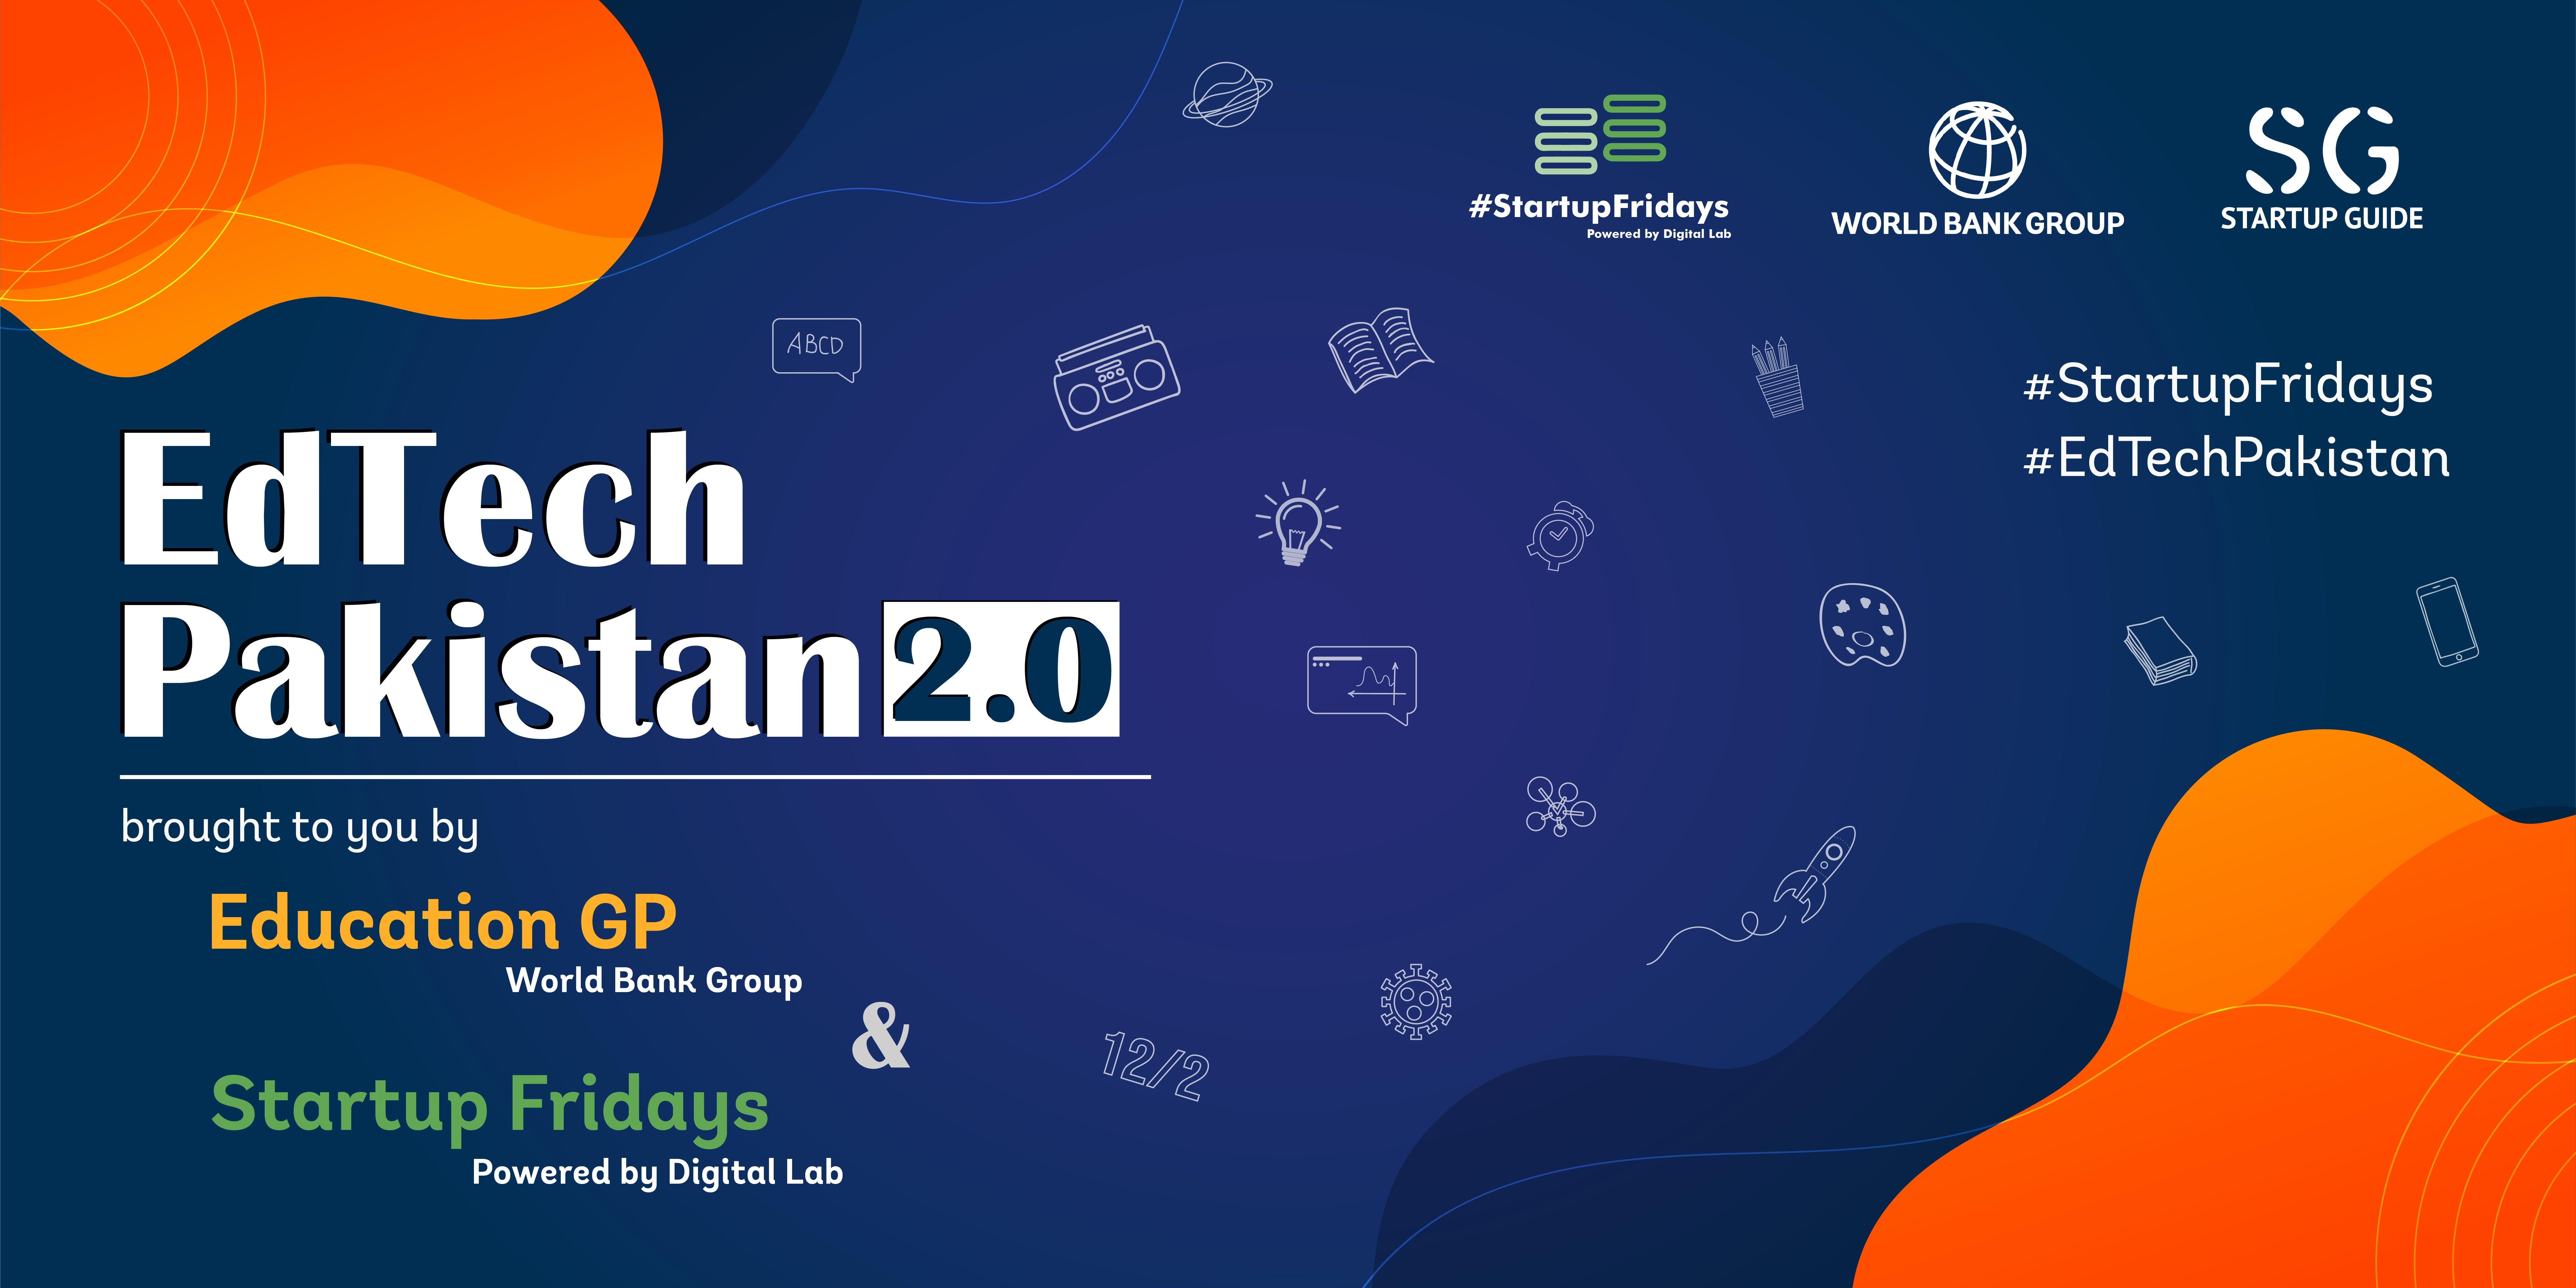 EdTech Pakistan 2.0 | #StartupFridays cover image